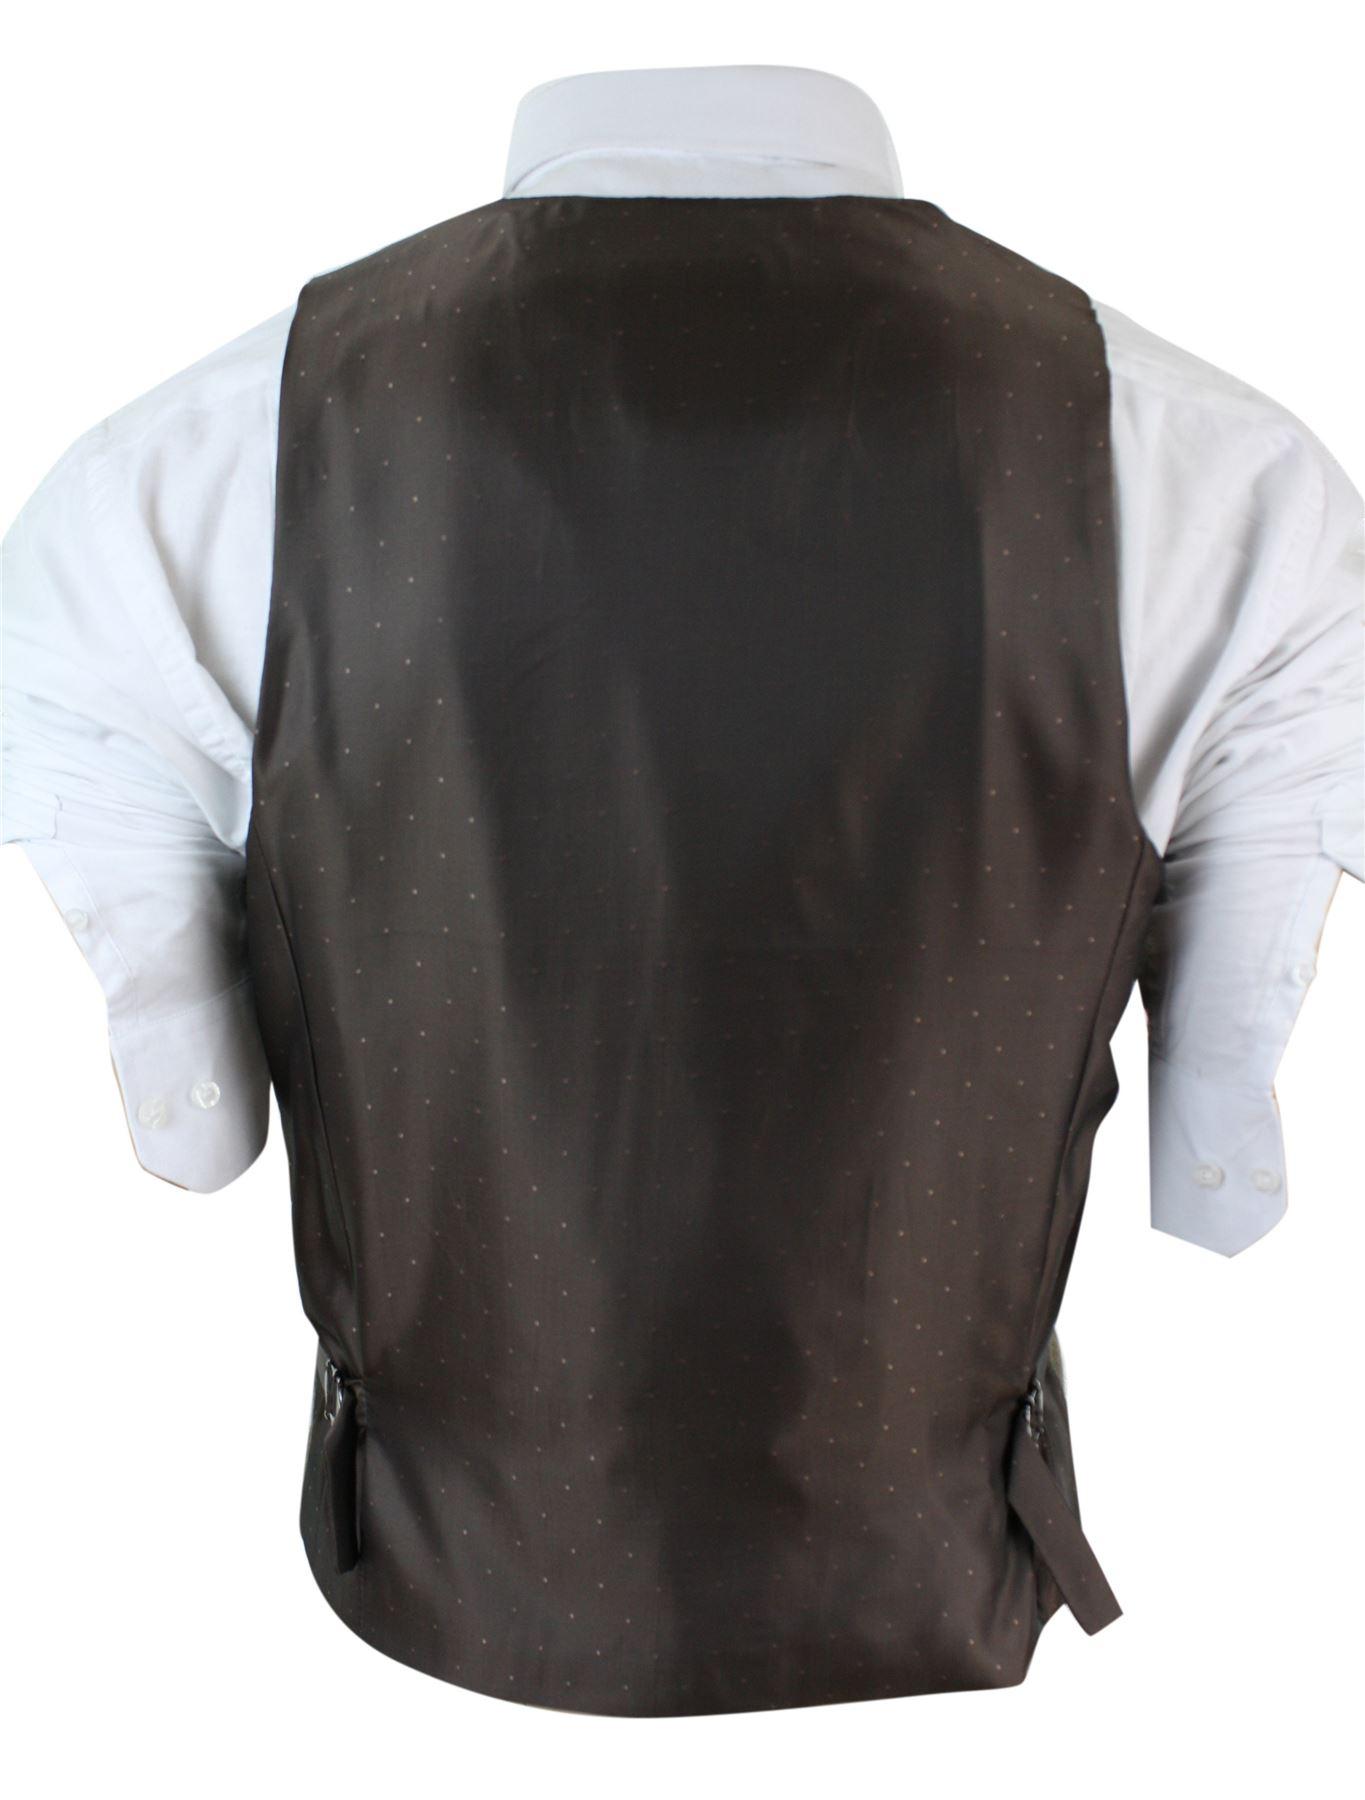 veste ou gilet homme tweed chevrons r tro vintage coupe ceintr e marron brun ebay. Black Bedroom Furniture Sets. Home Design Ideas